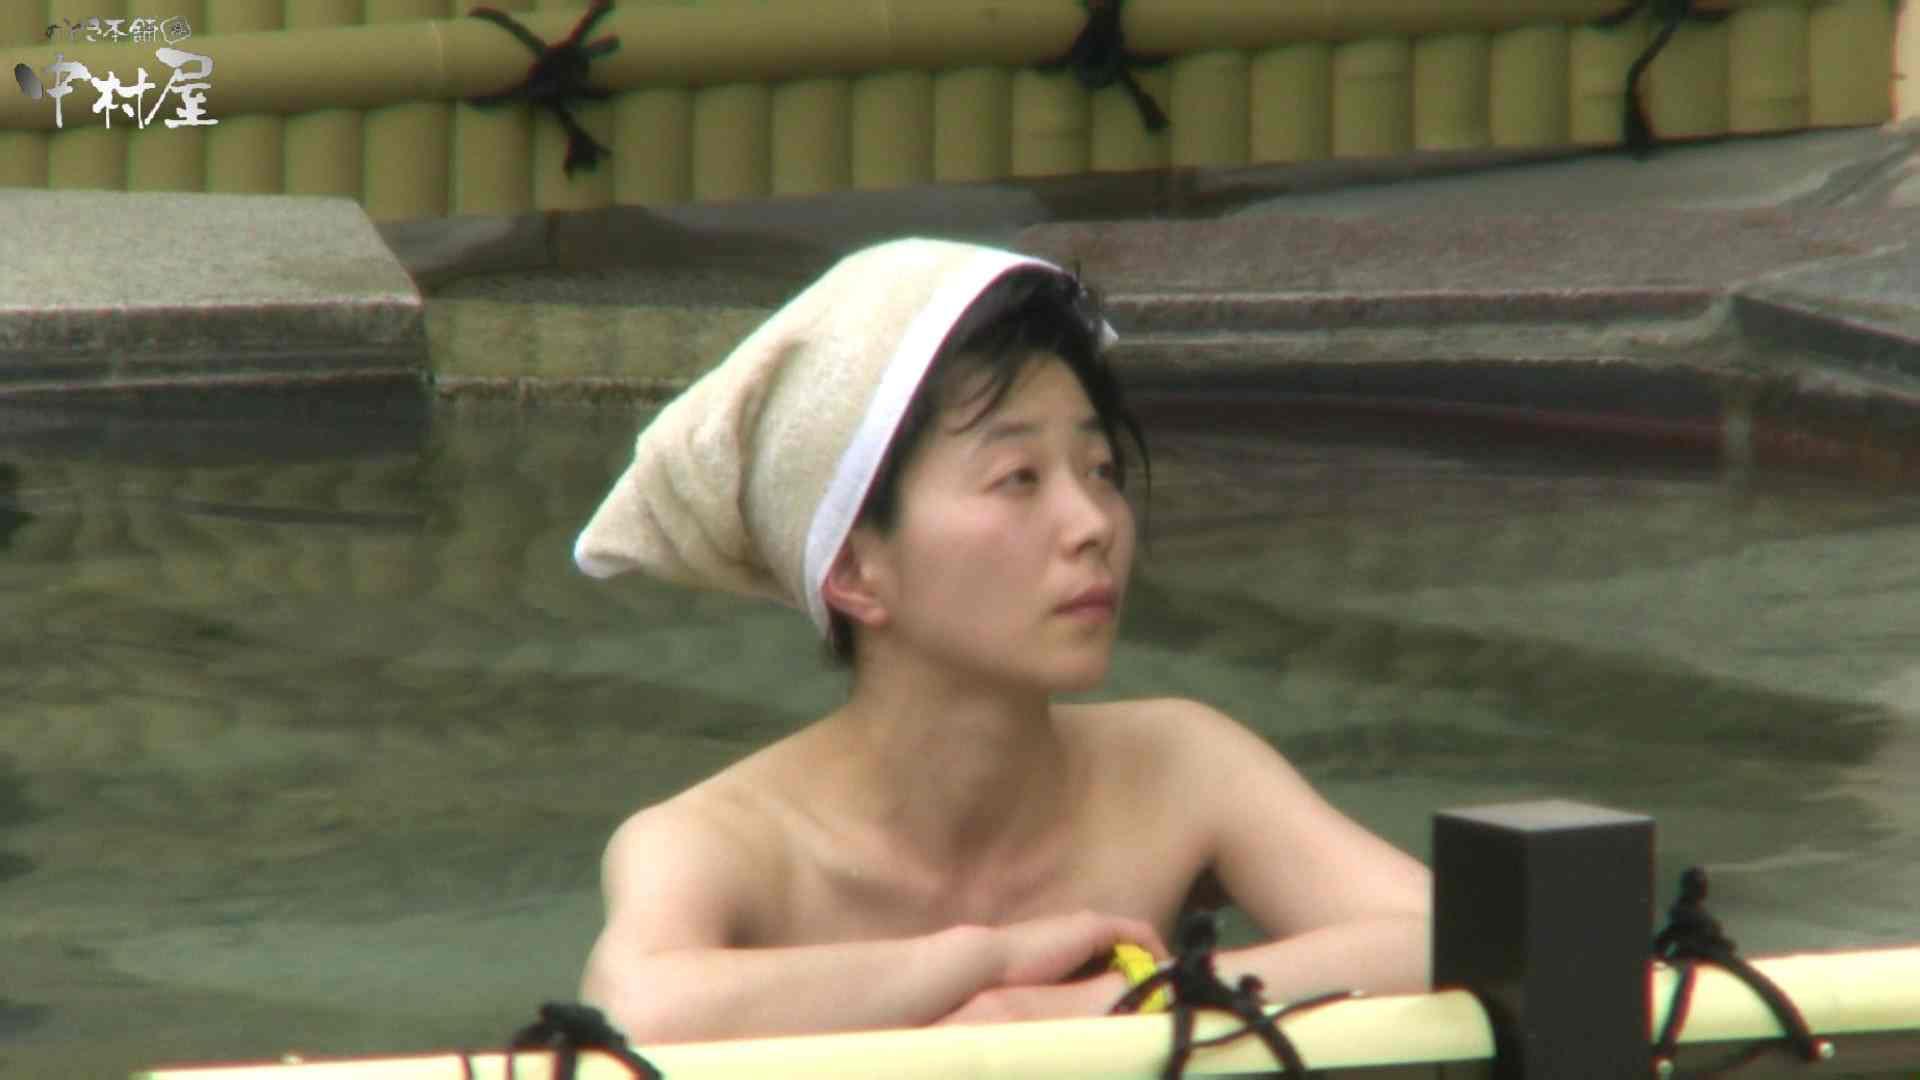 Aquaな露天風呂Vol.950 盗撮シリーズ   露天風呂編  80PIX 61